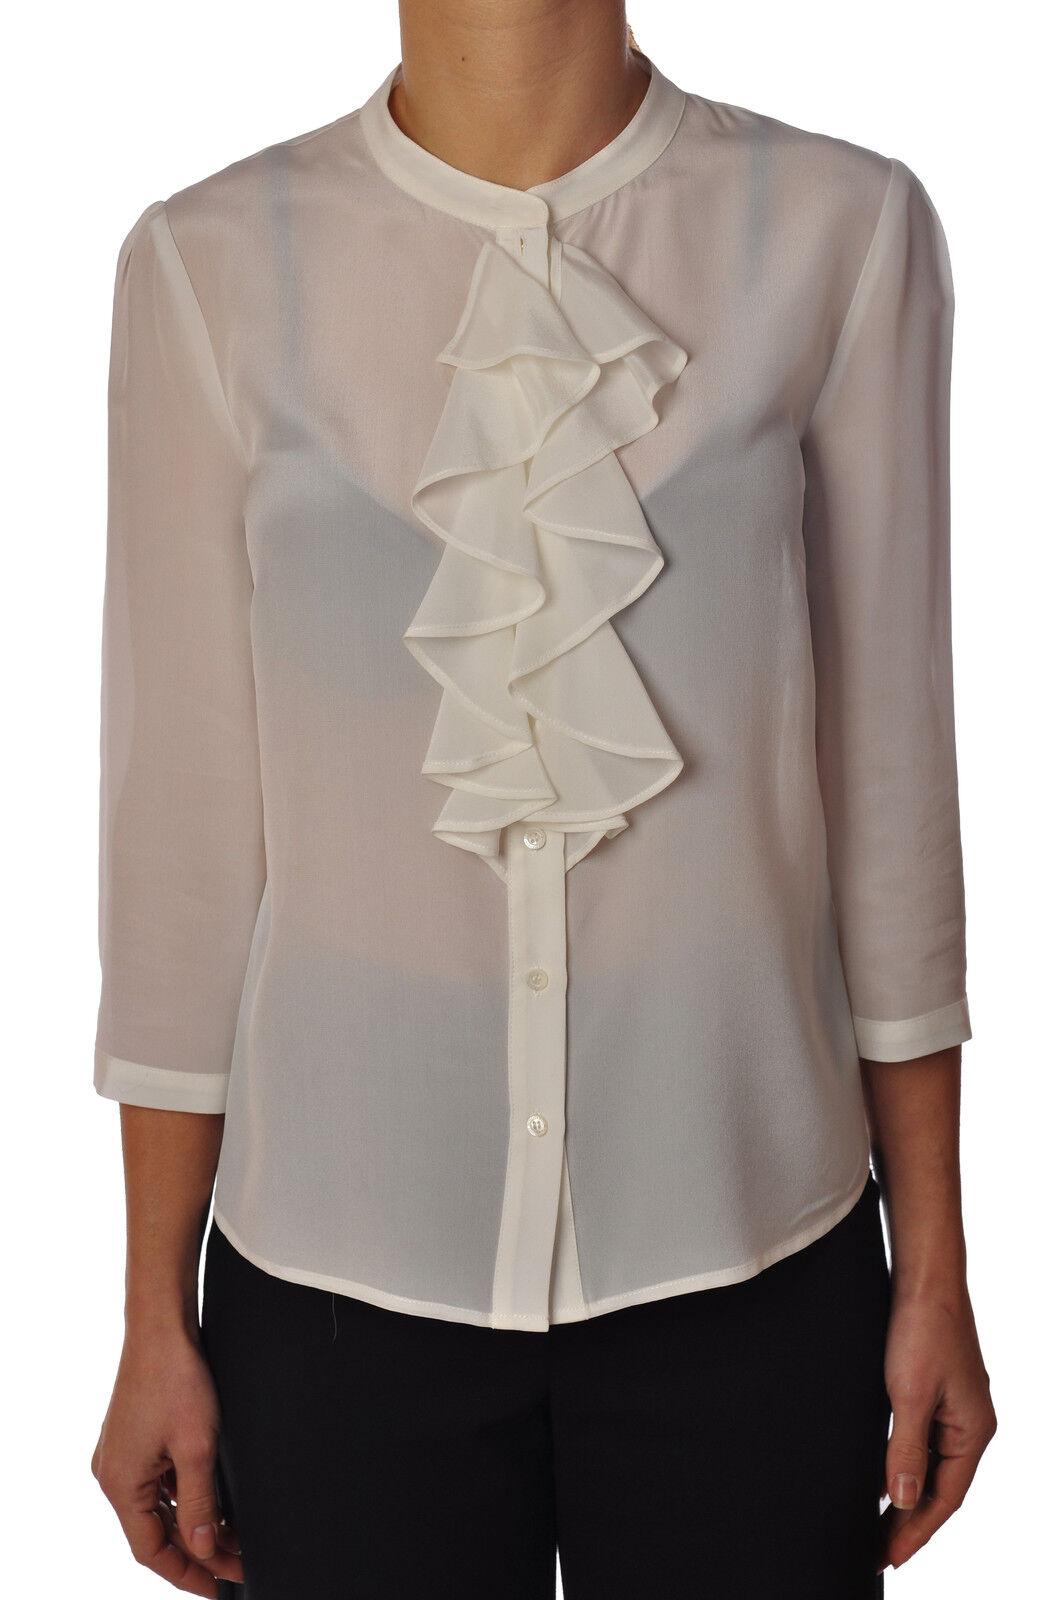 Patrizia Pepe - Shirts-Shirt - Woman - Weiß - 3279210D190700